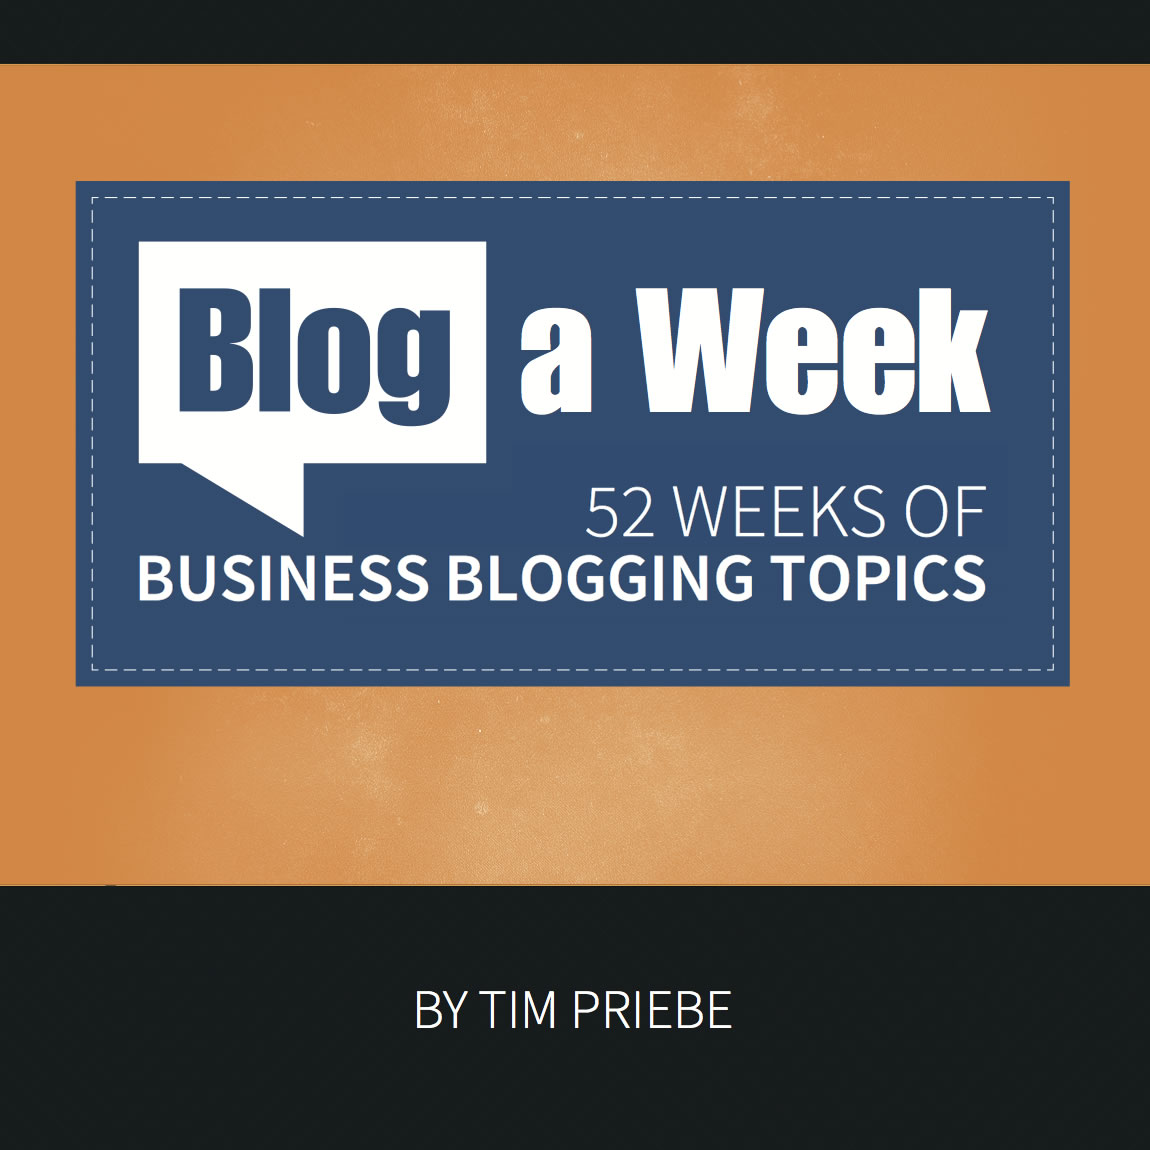 blog a week